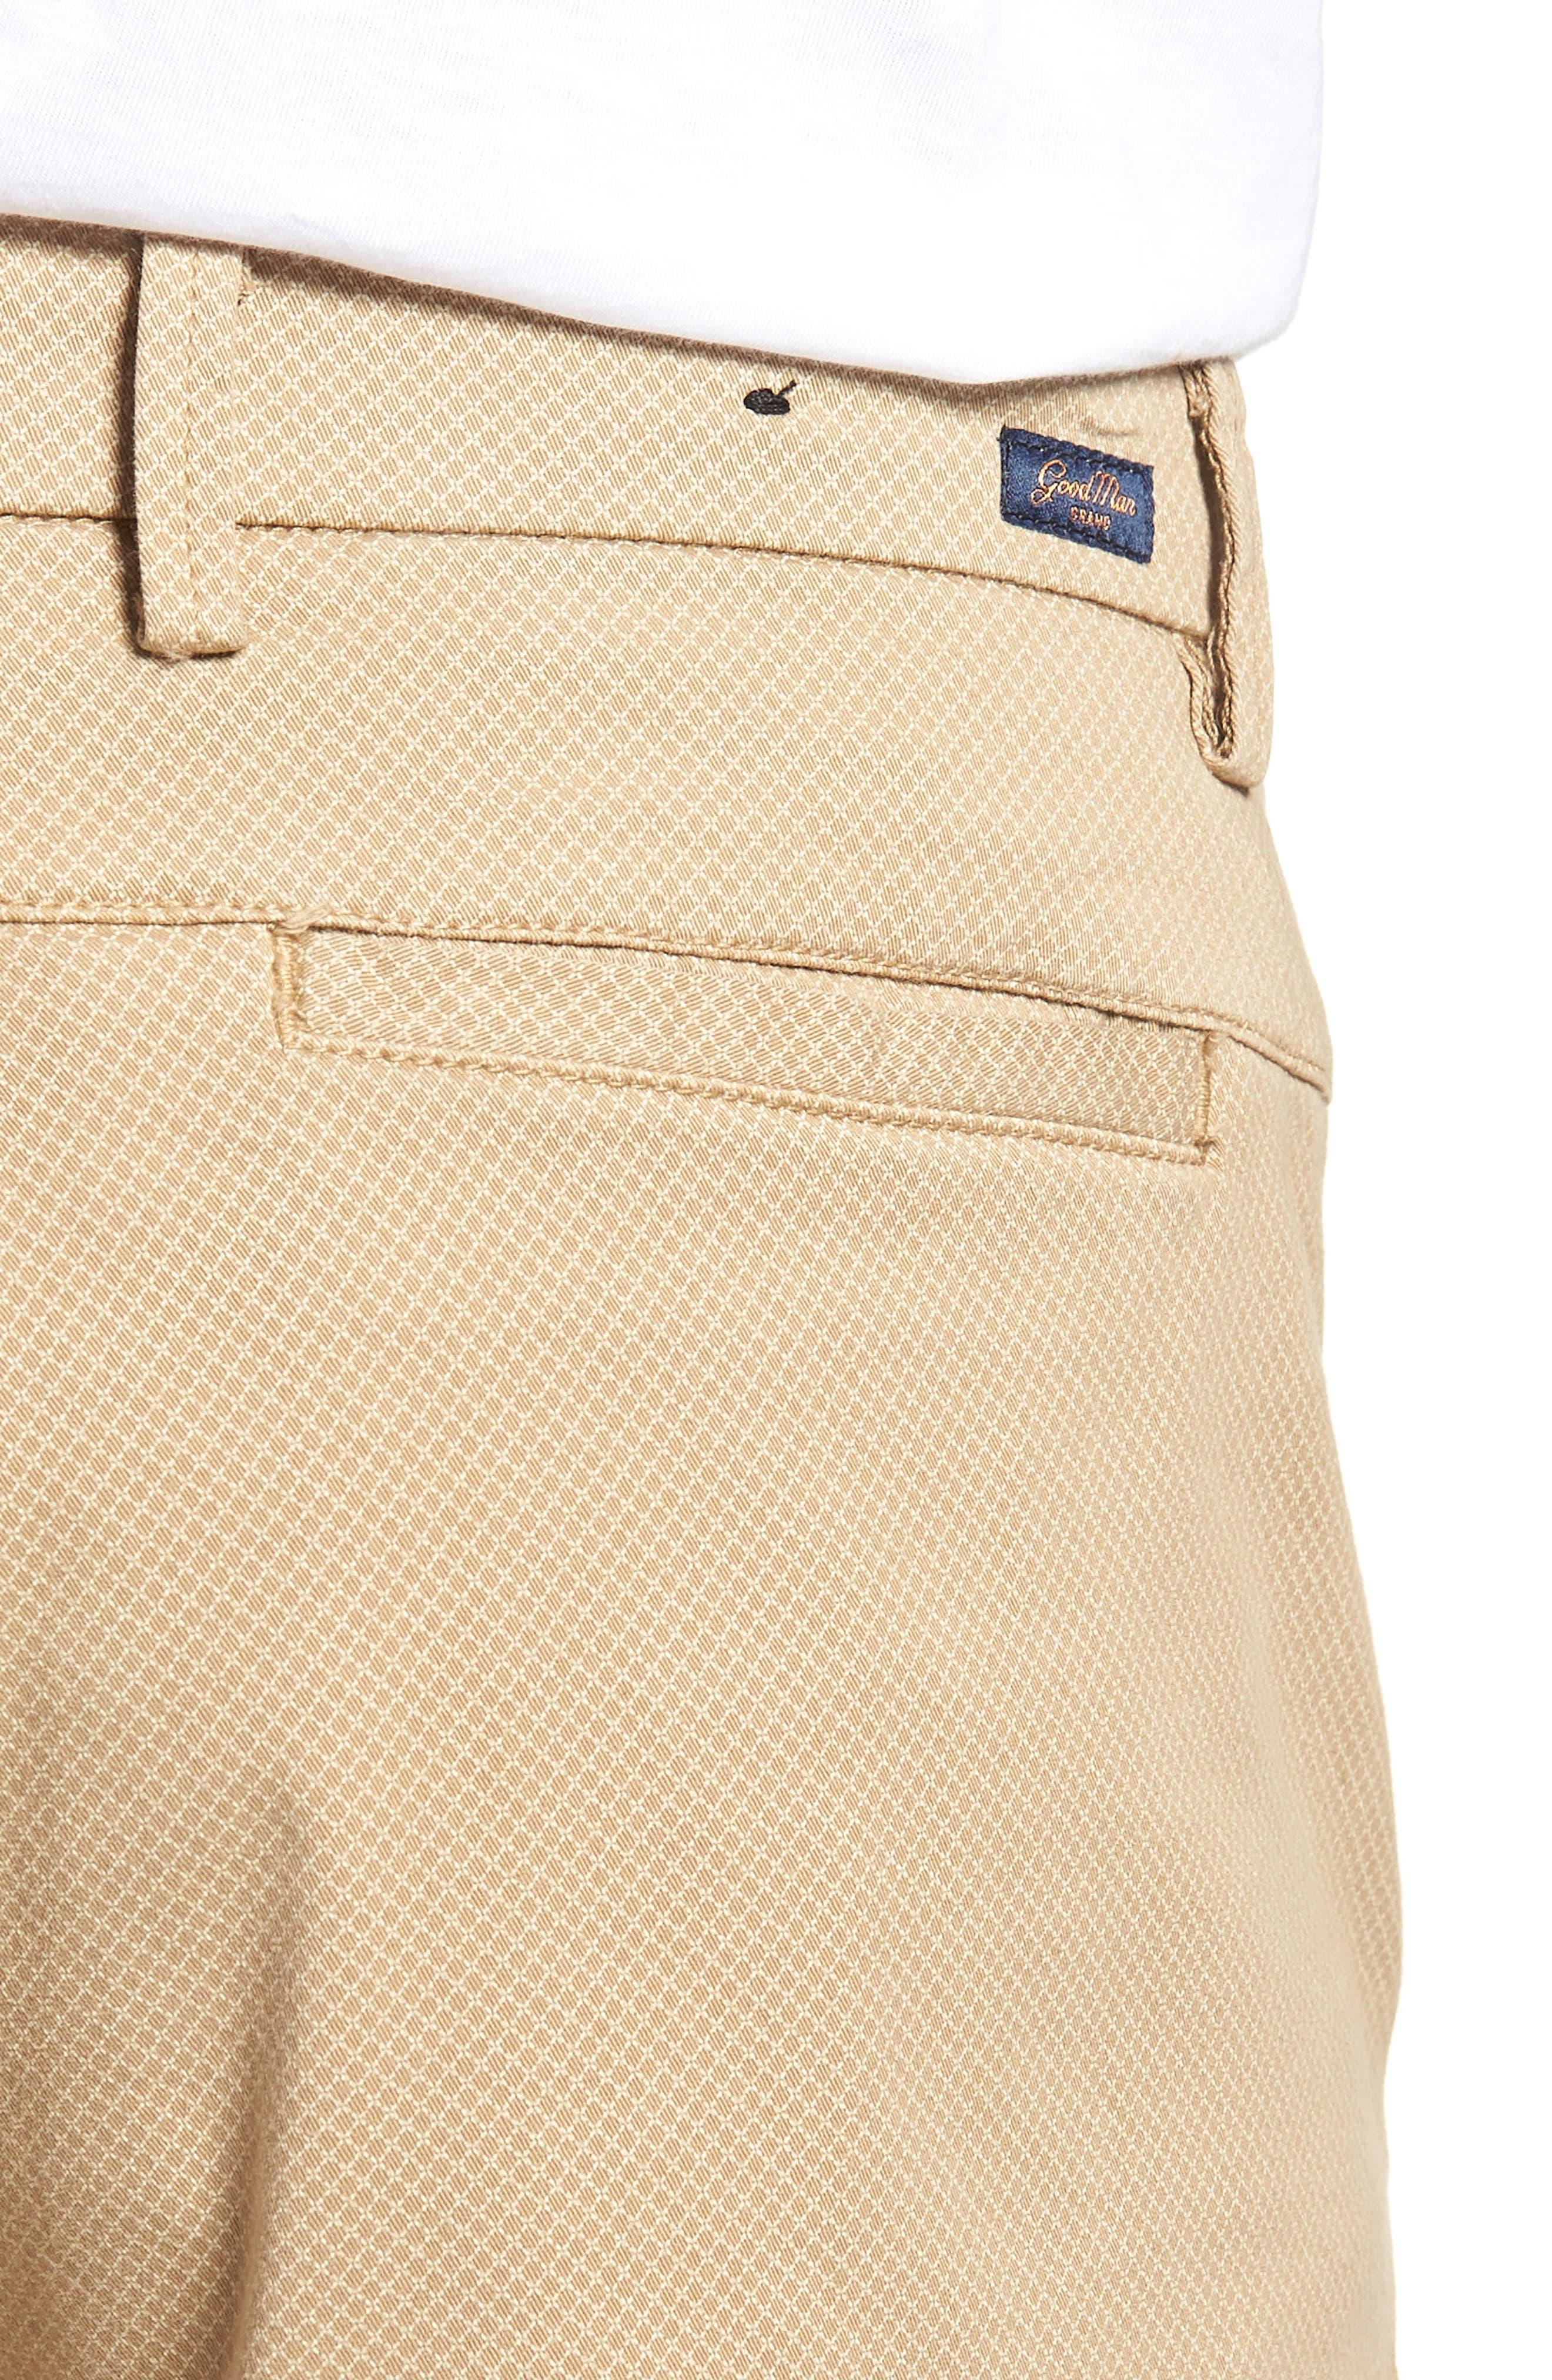 Monaco Diamond Dash Modern Fit Chino Shorts,                             Alternate thumbnail 4, color,                             Khaki